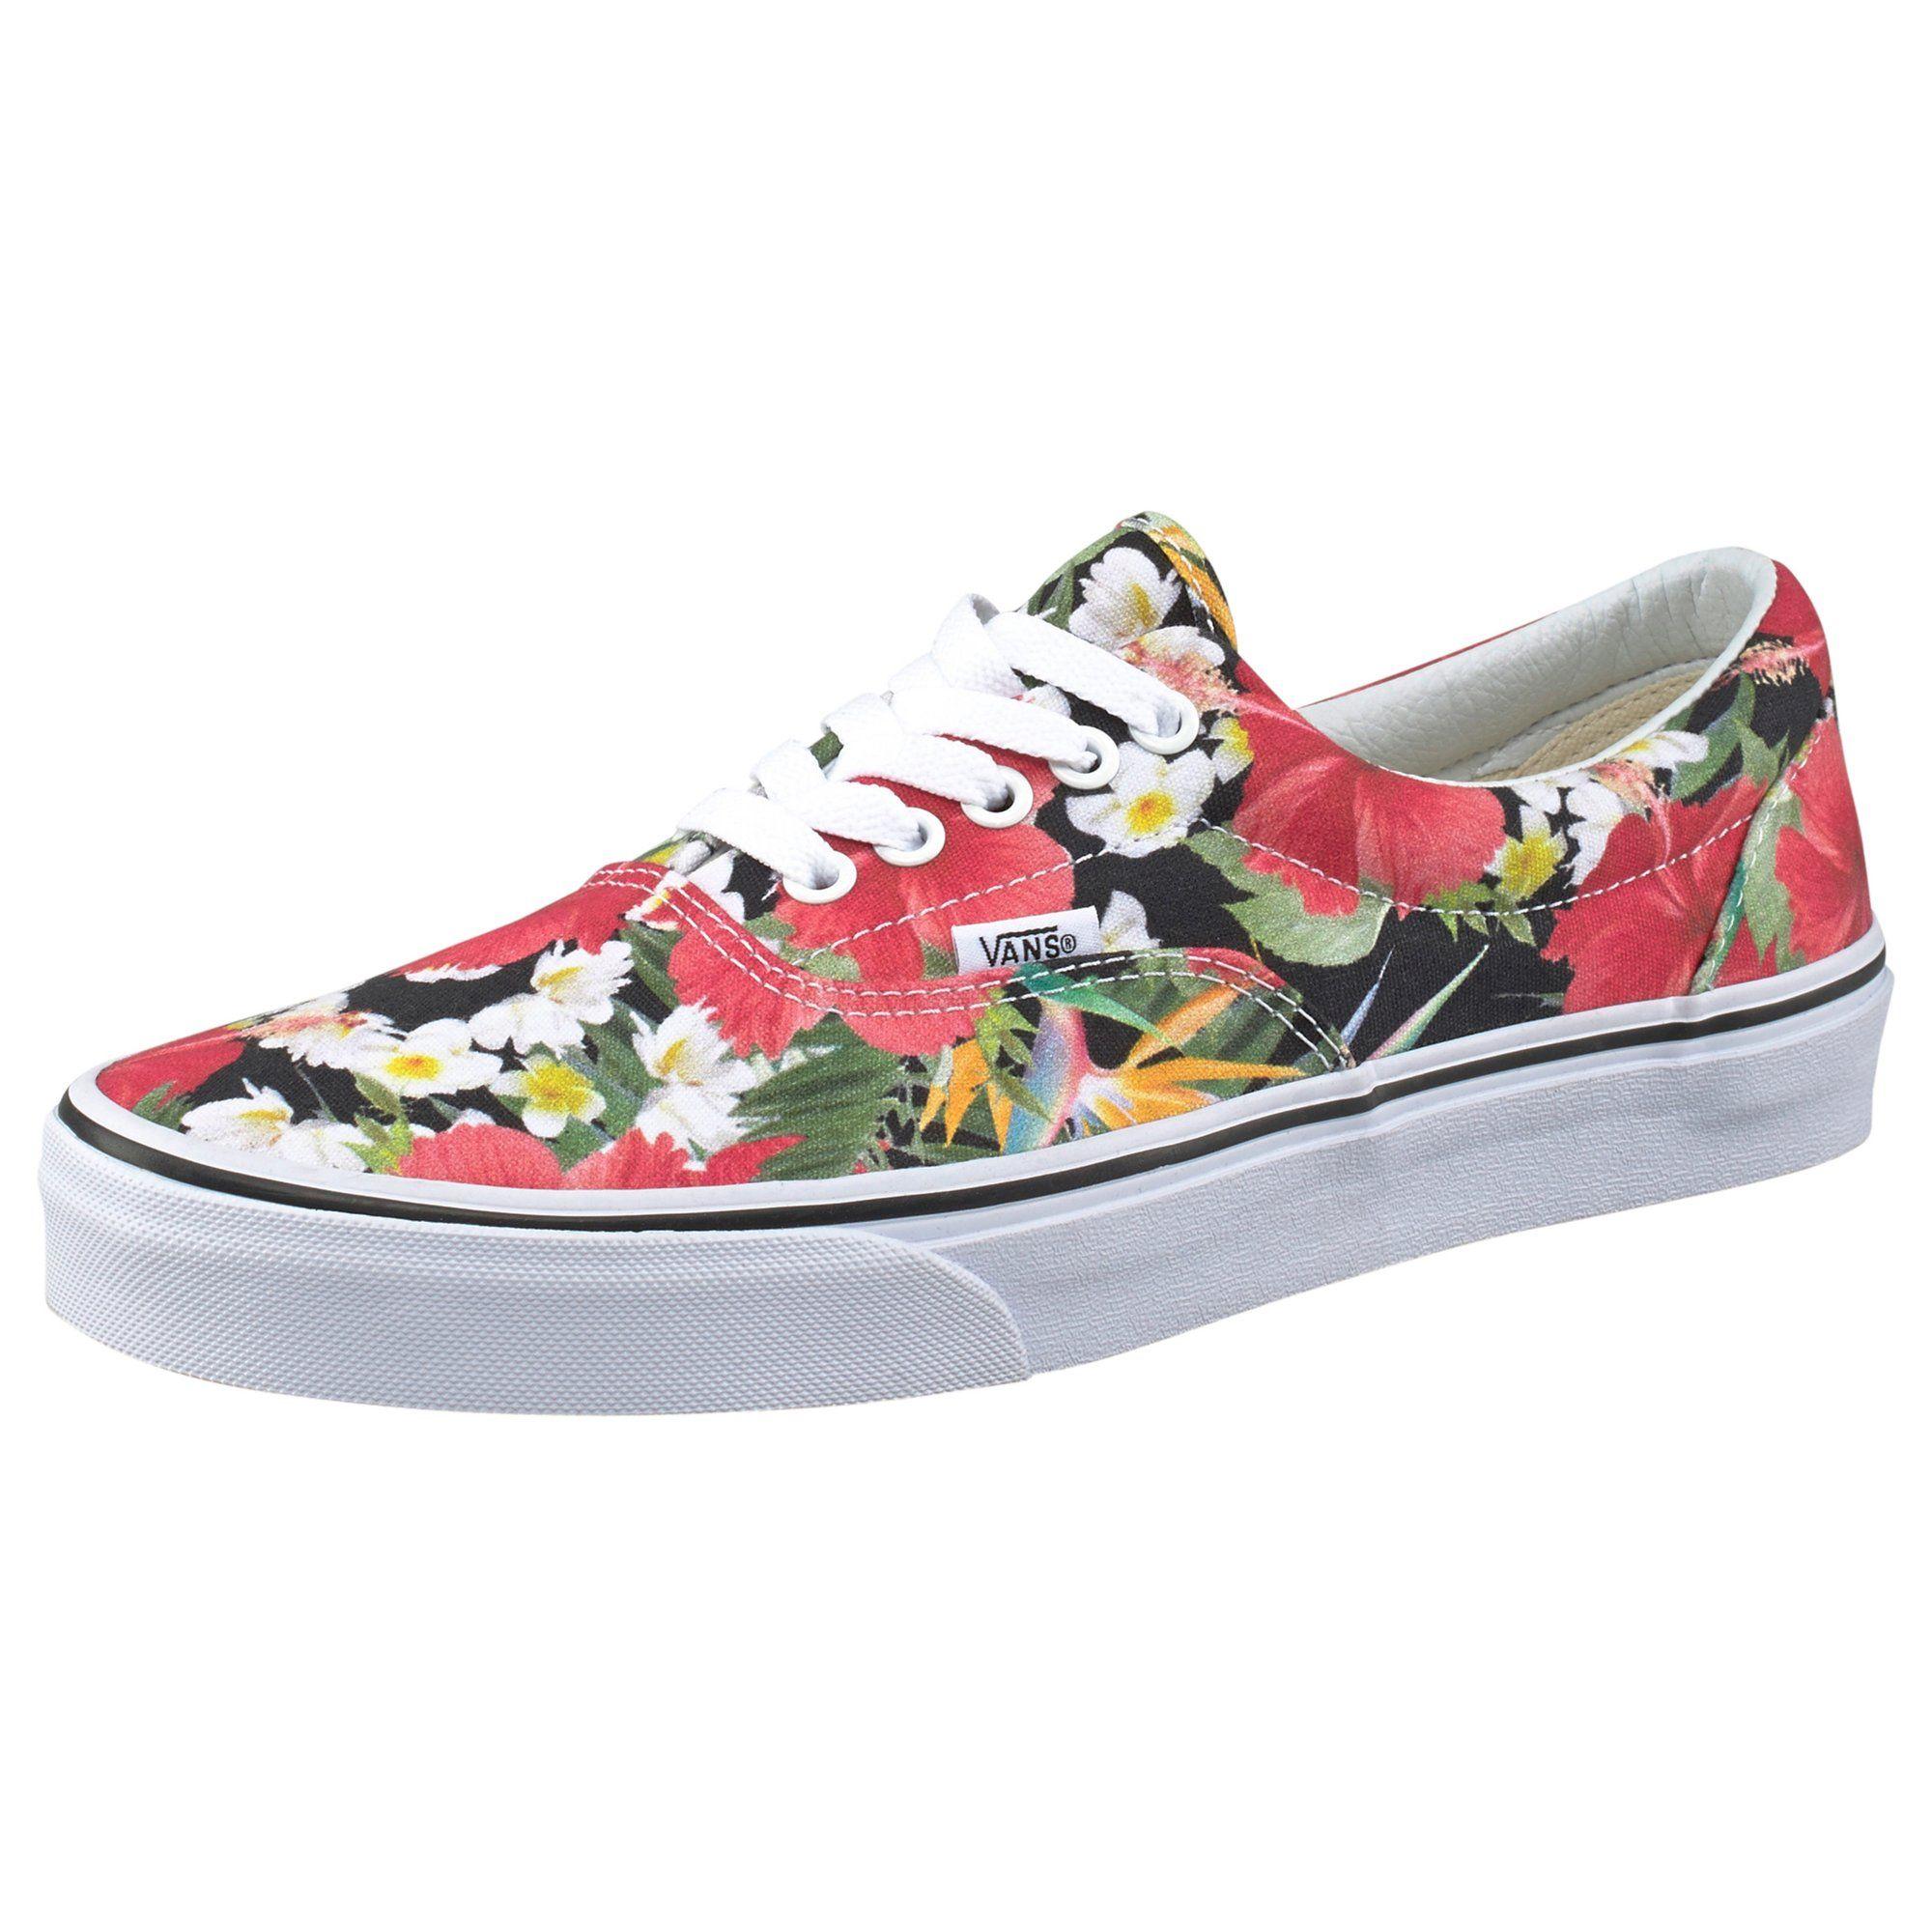 chaussure vans femme old skool a fleurs